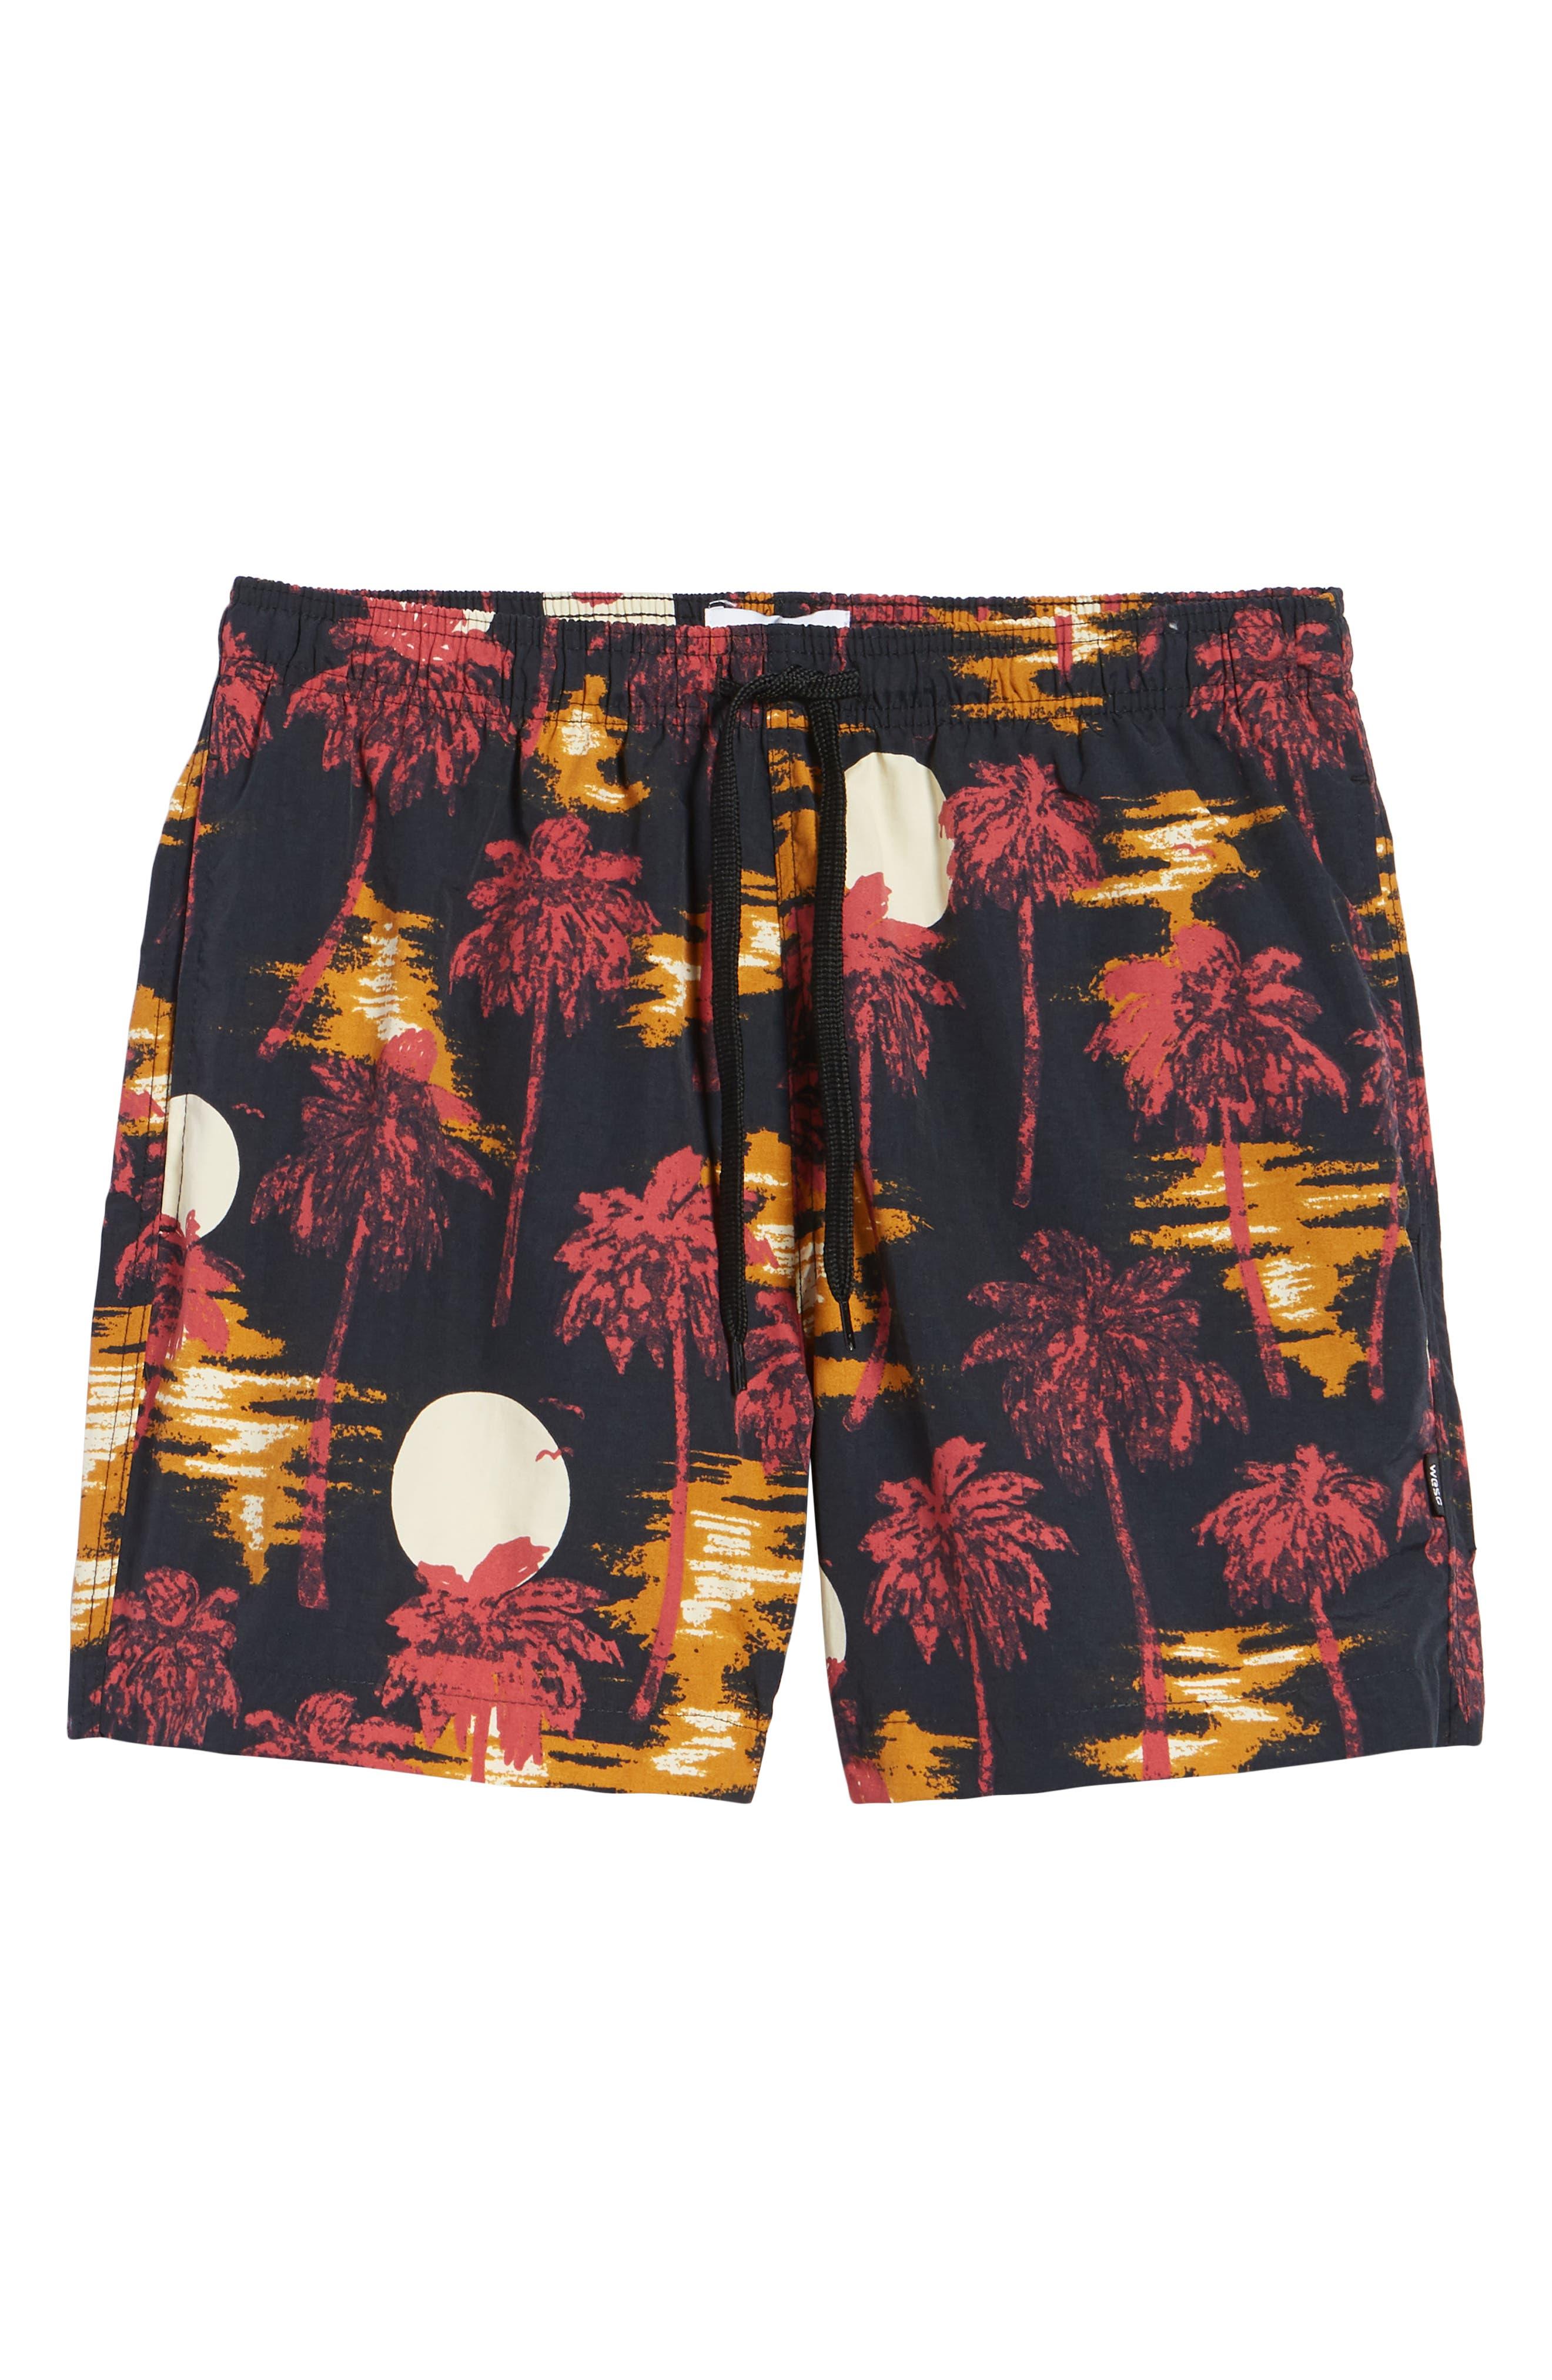 Zack Hawaii Swim Trunks,                             Alternate thumbnail 6, color,                             Hawaii Night